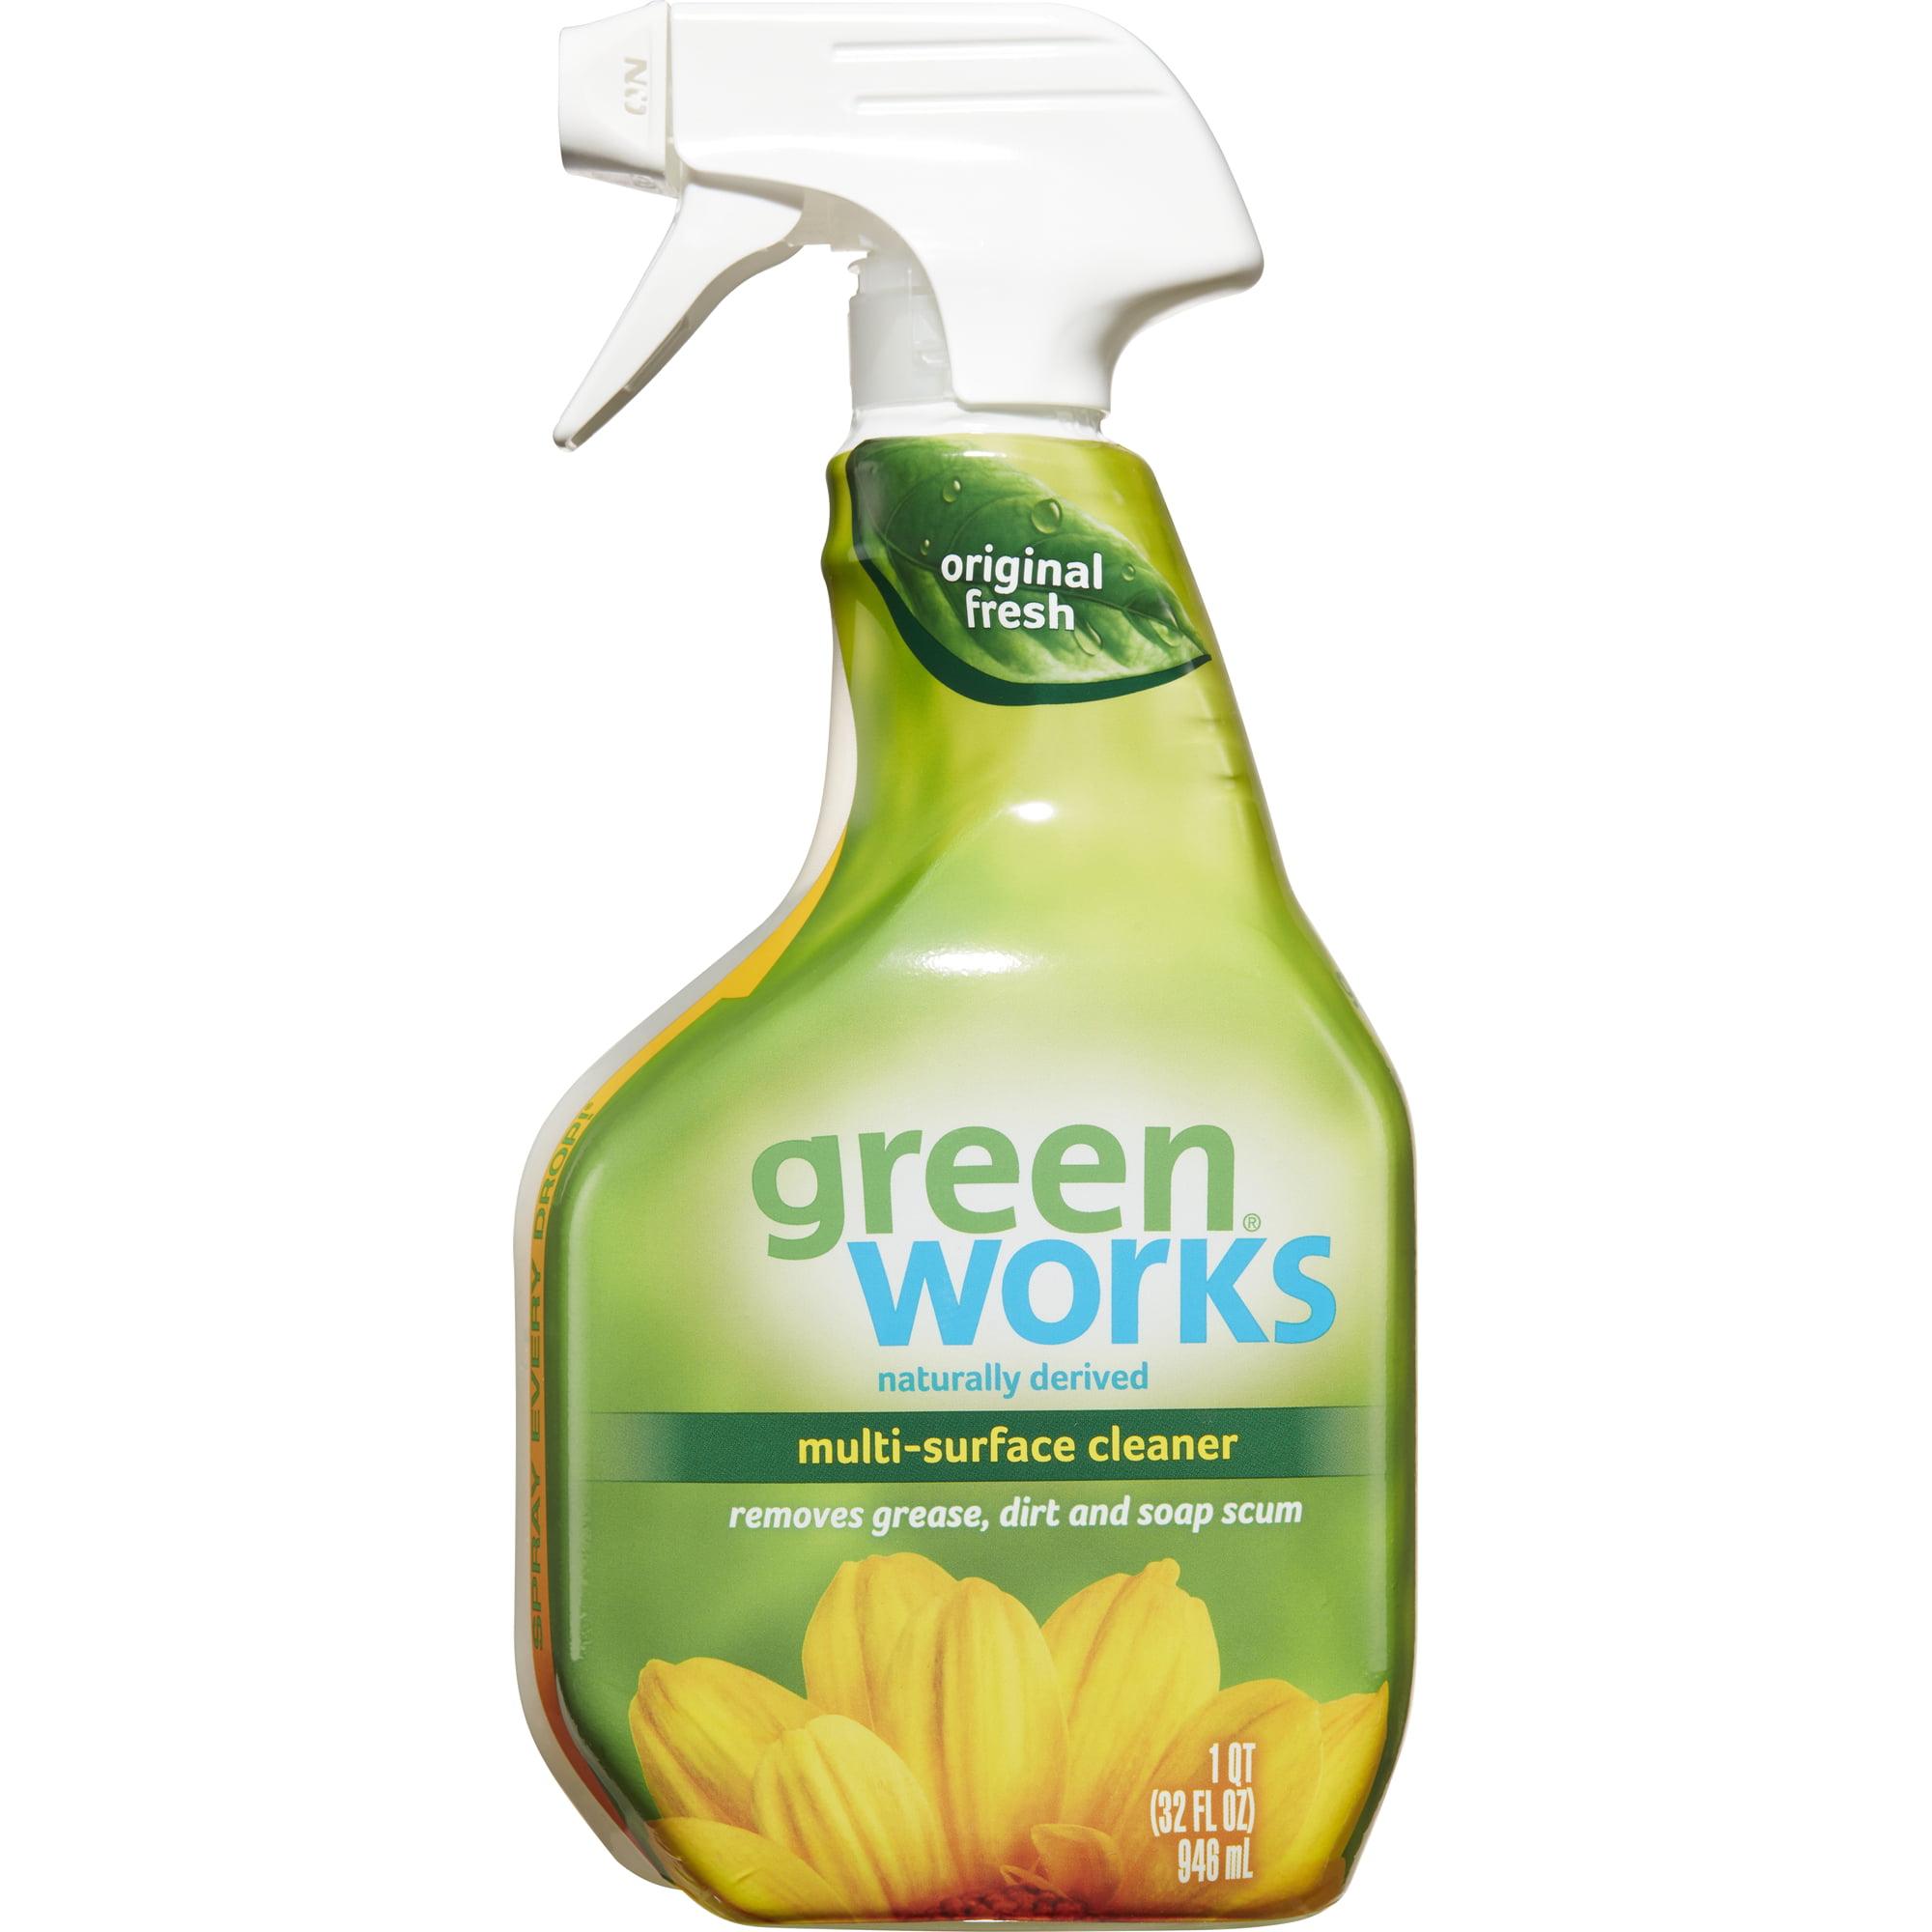 Green Works Multi-Surface Cleaner, Spray Bottle, Original Fresh, 32 oz